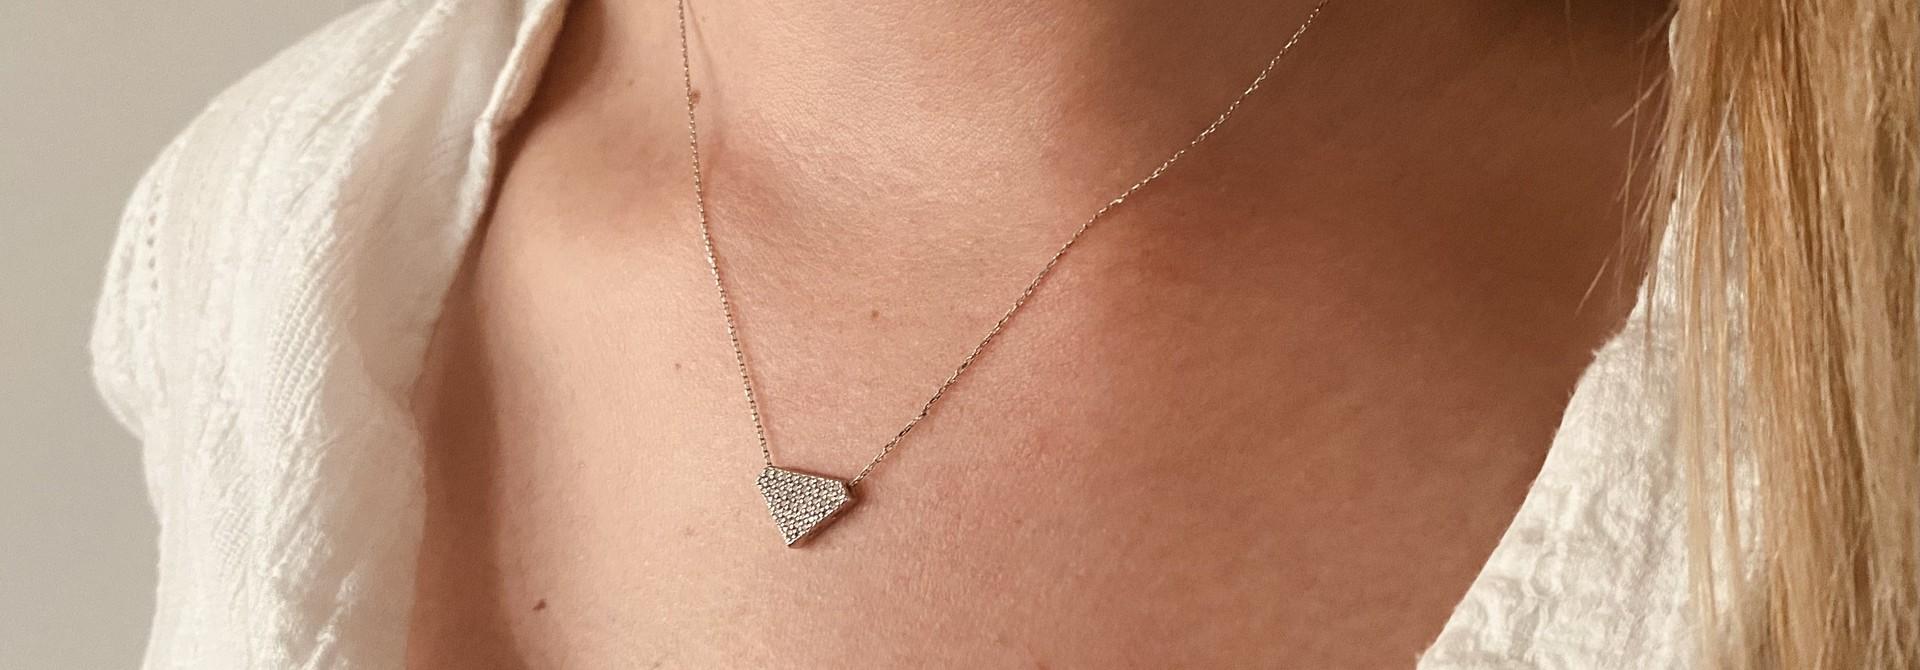 Ketting met vaste hanger diamantvorm witgoud